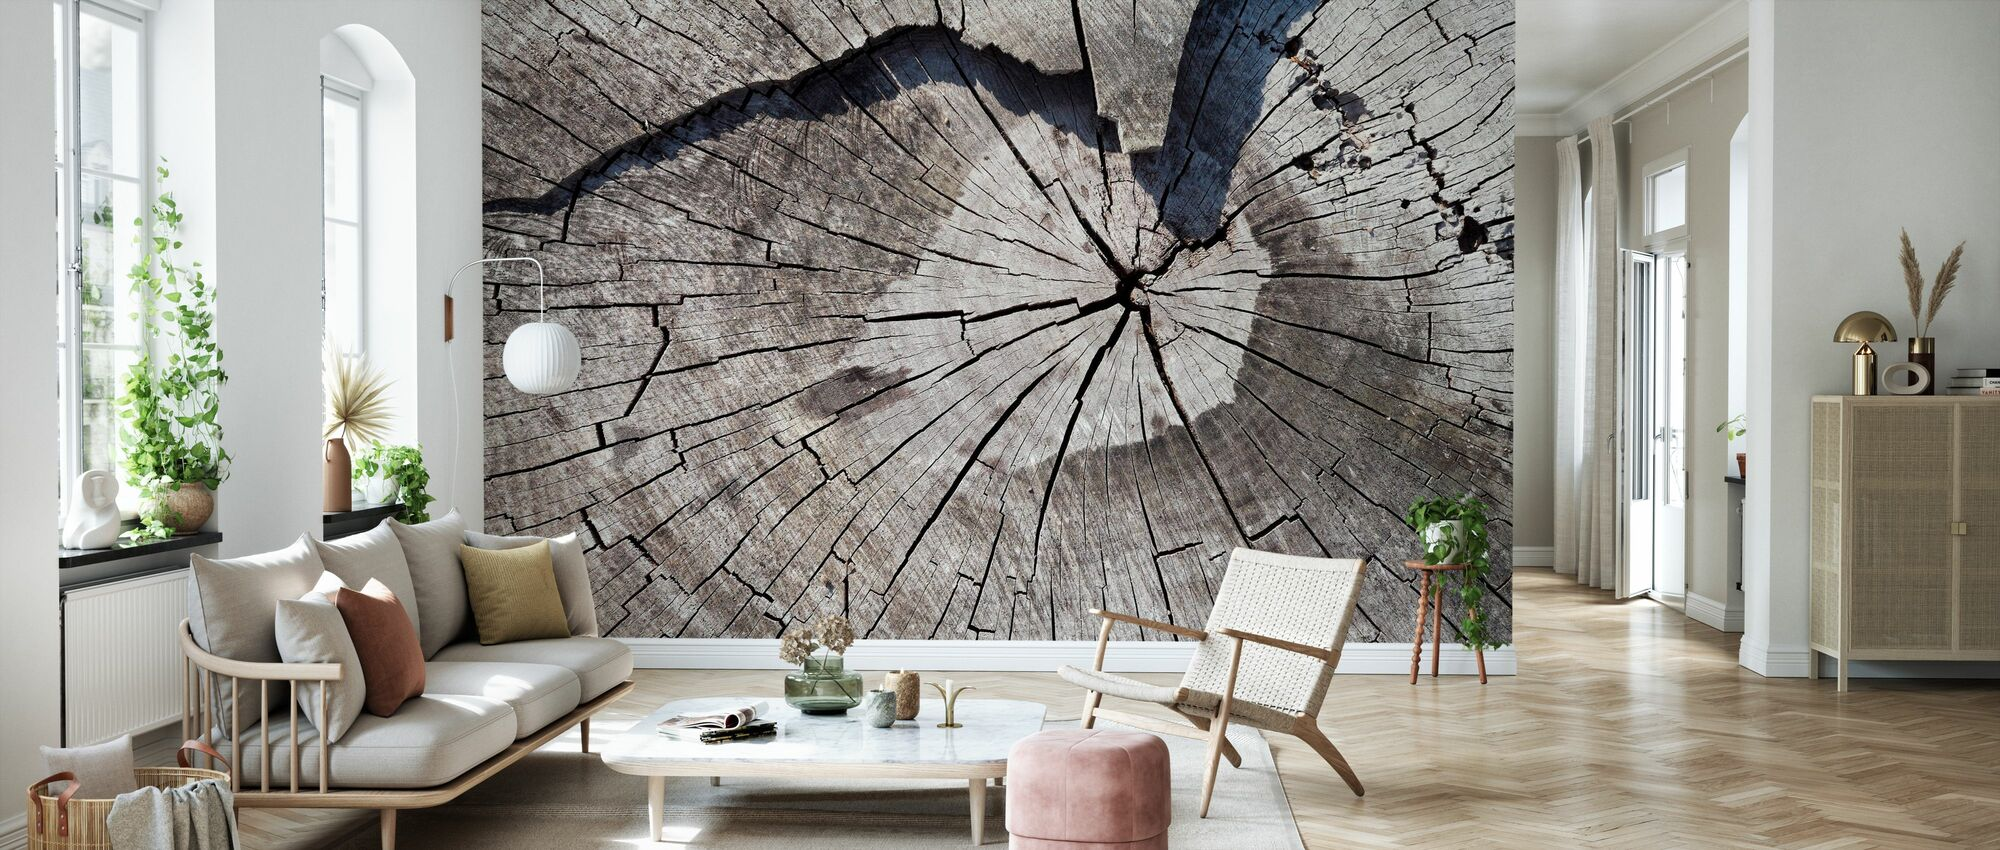 Old Tree Trunk - Wallpaper - Living Room